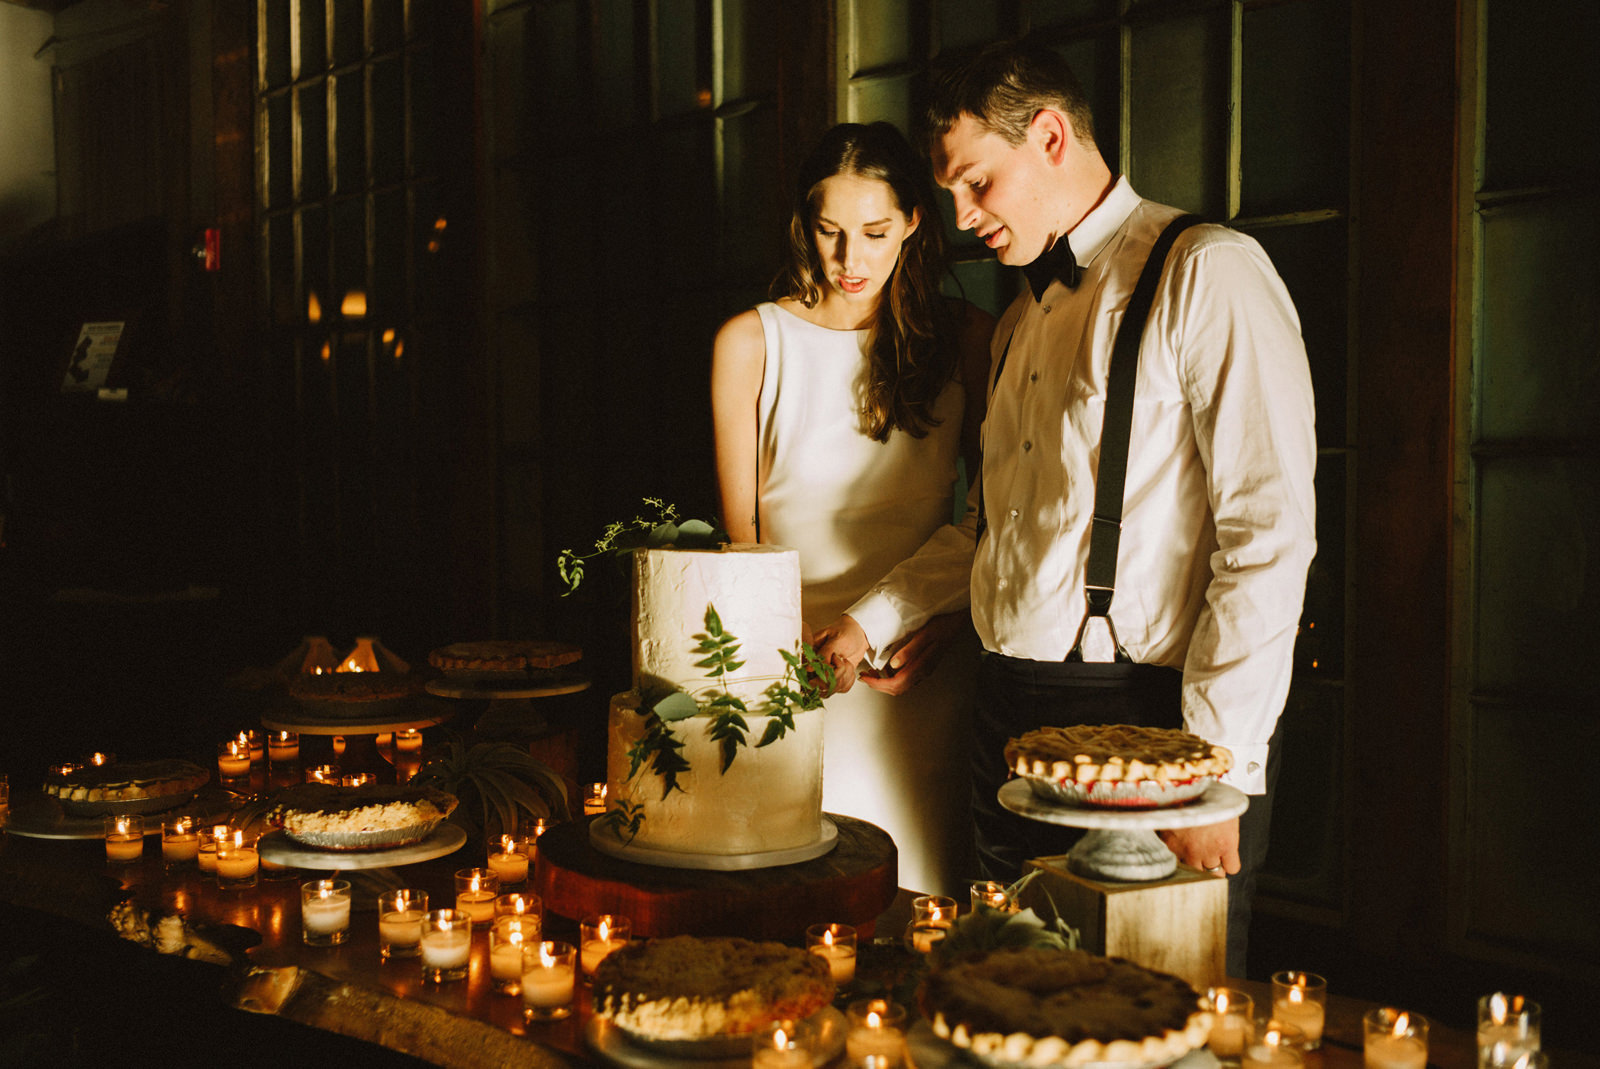 sodo-park-wedding-073 SODO PARK WEDDING